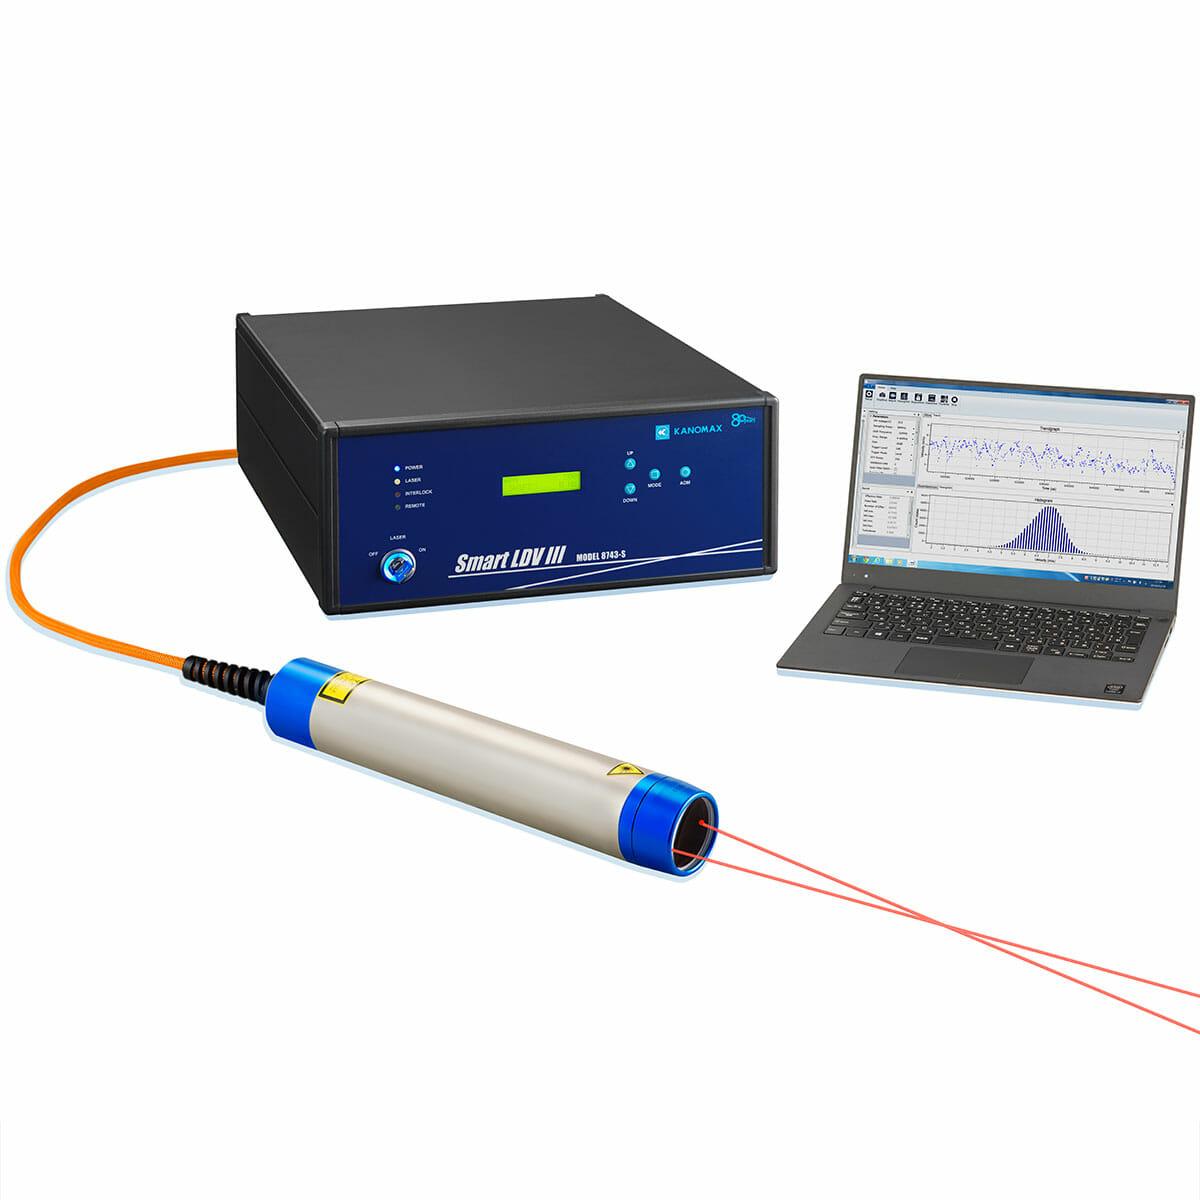 Kanomax Smart LDV III